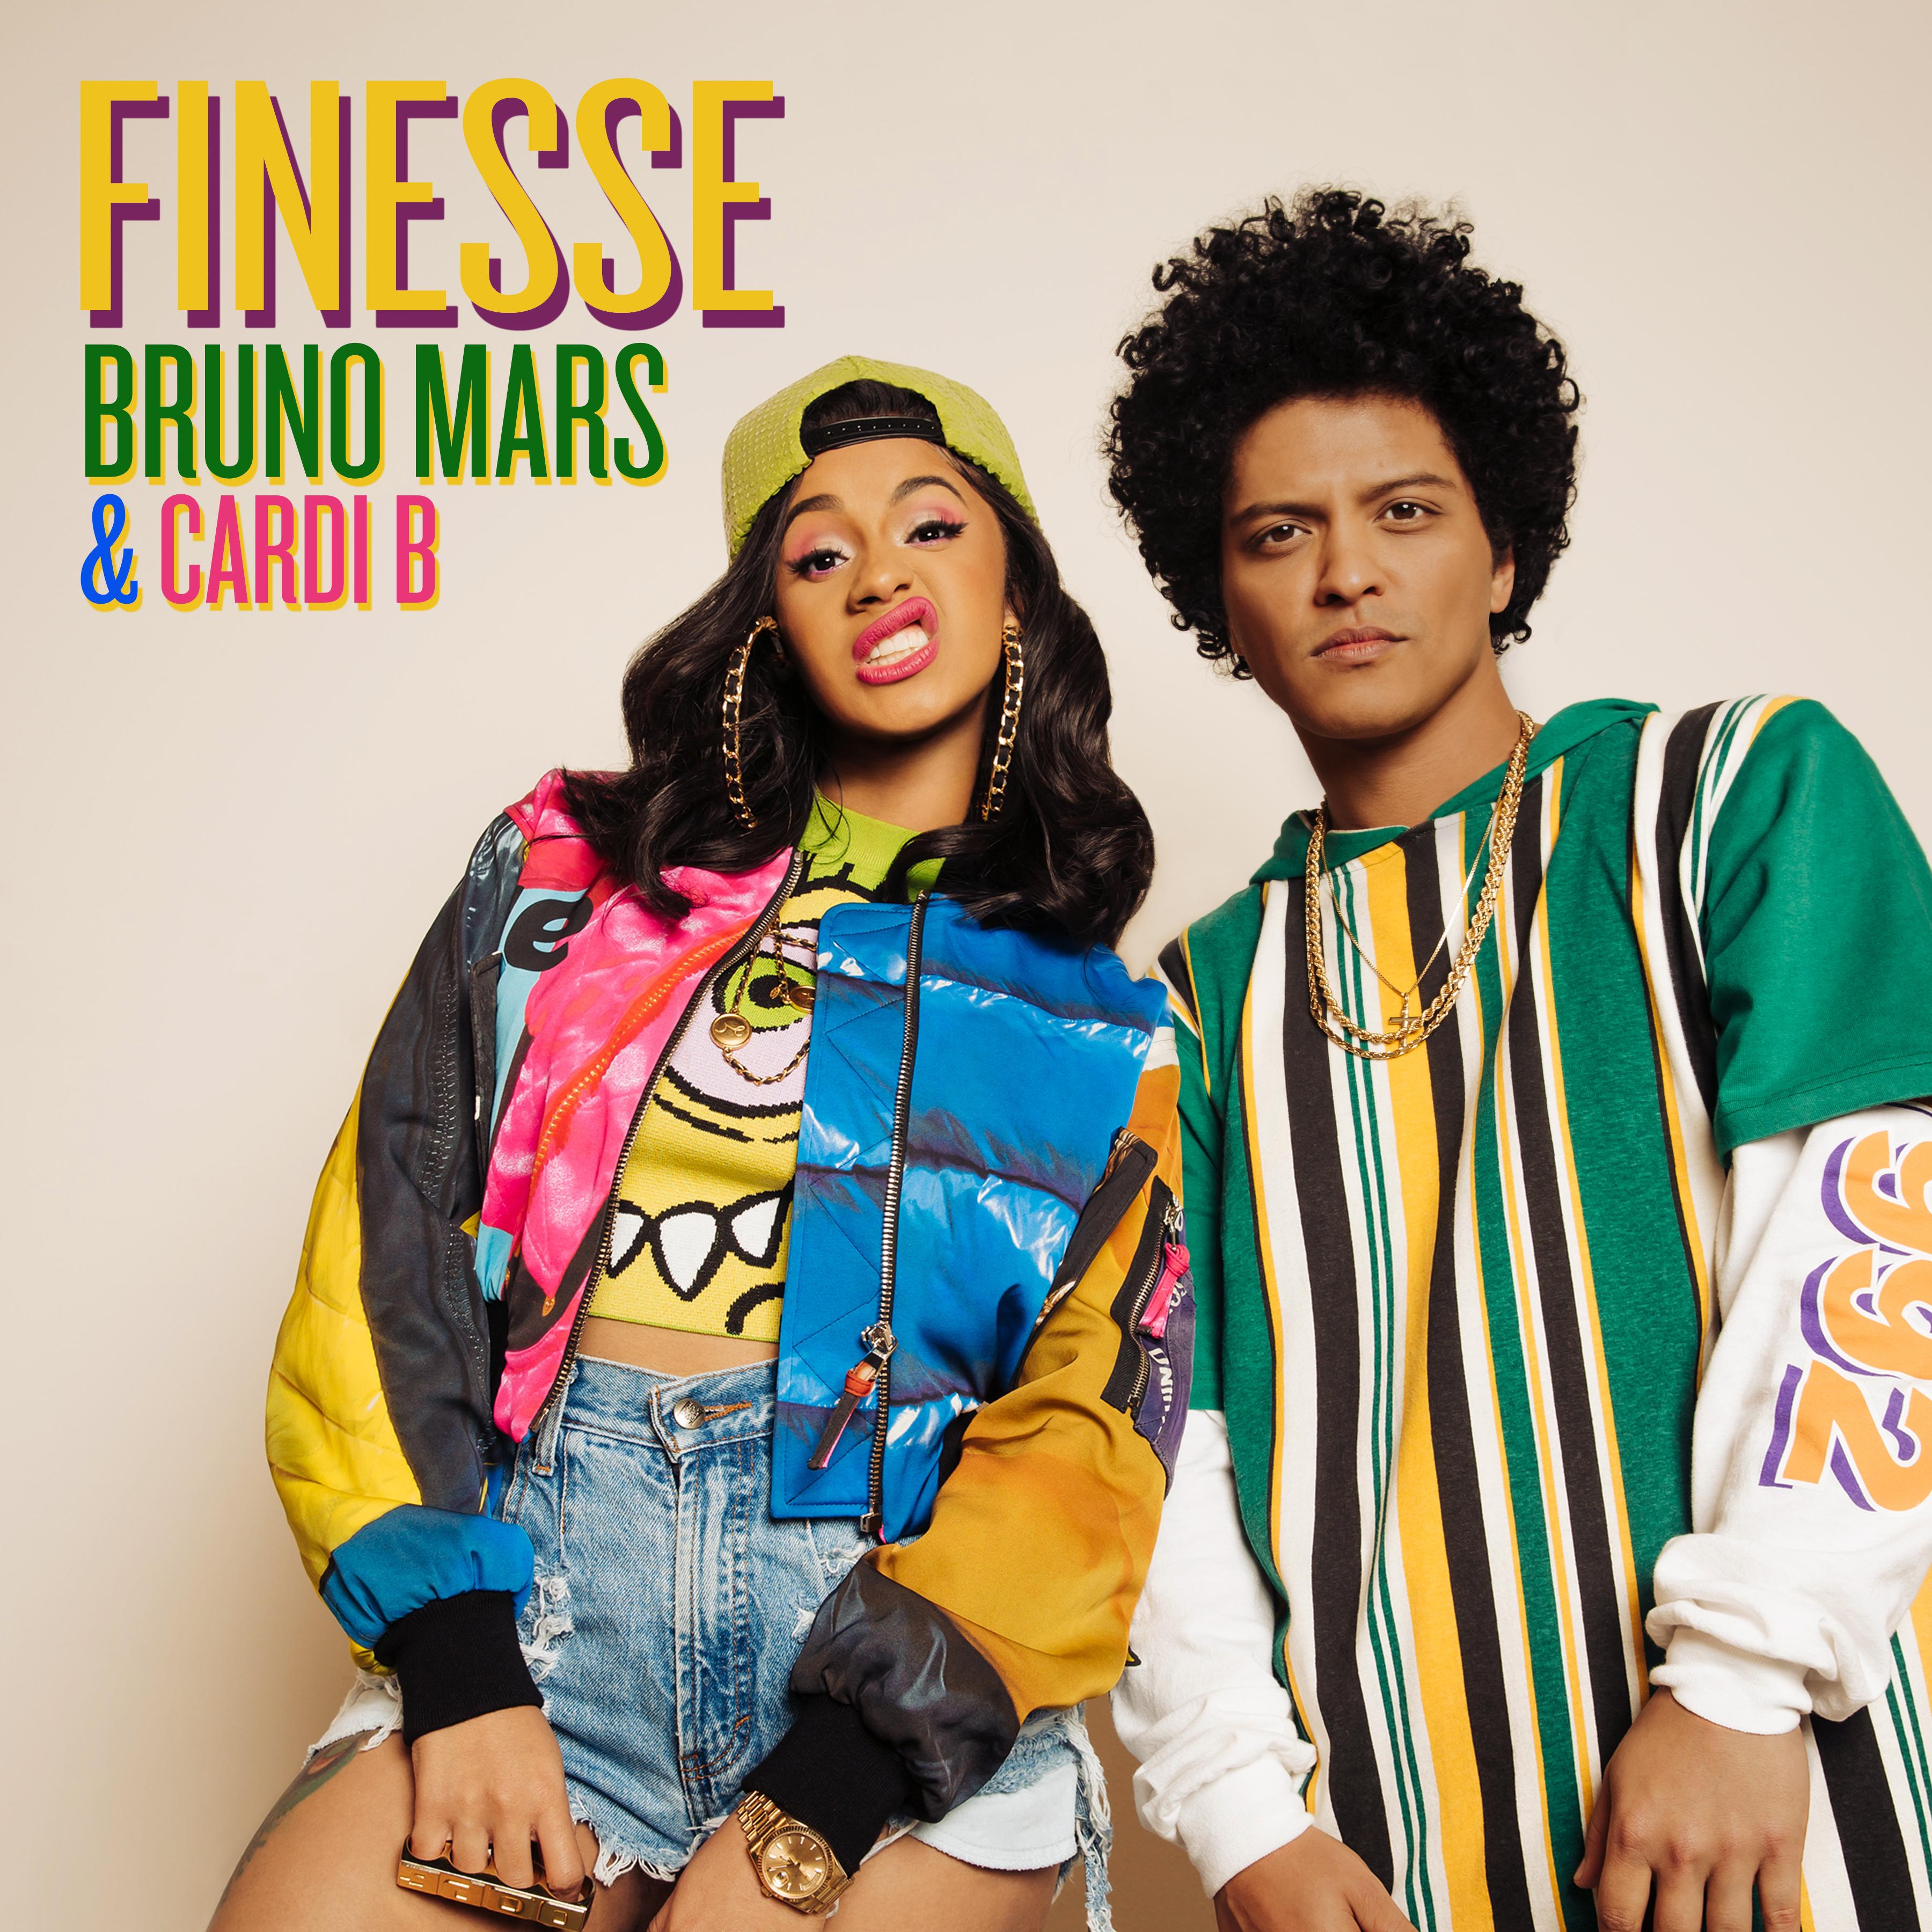 BRUNO MARS & CARDI B – FINESSE